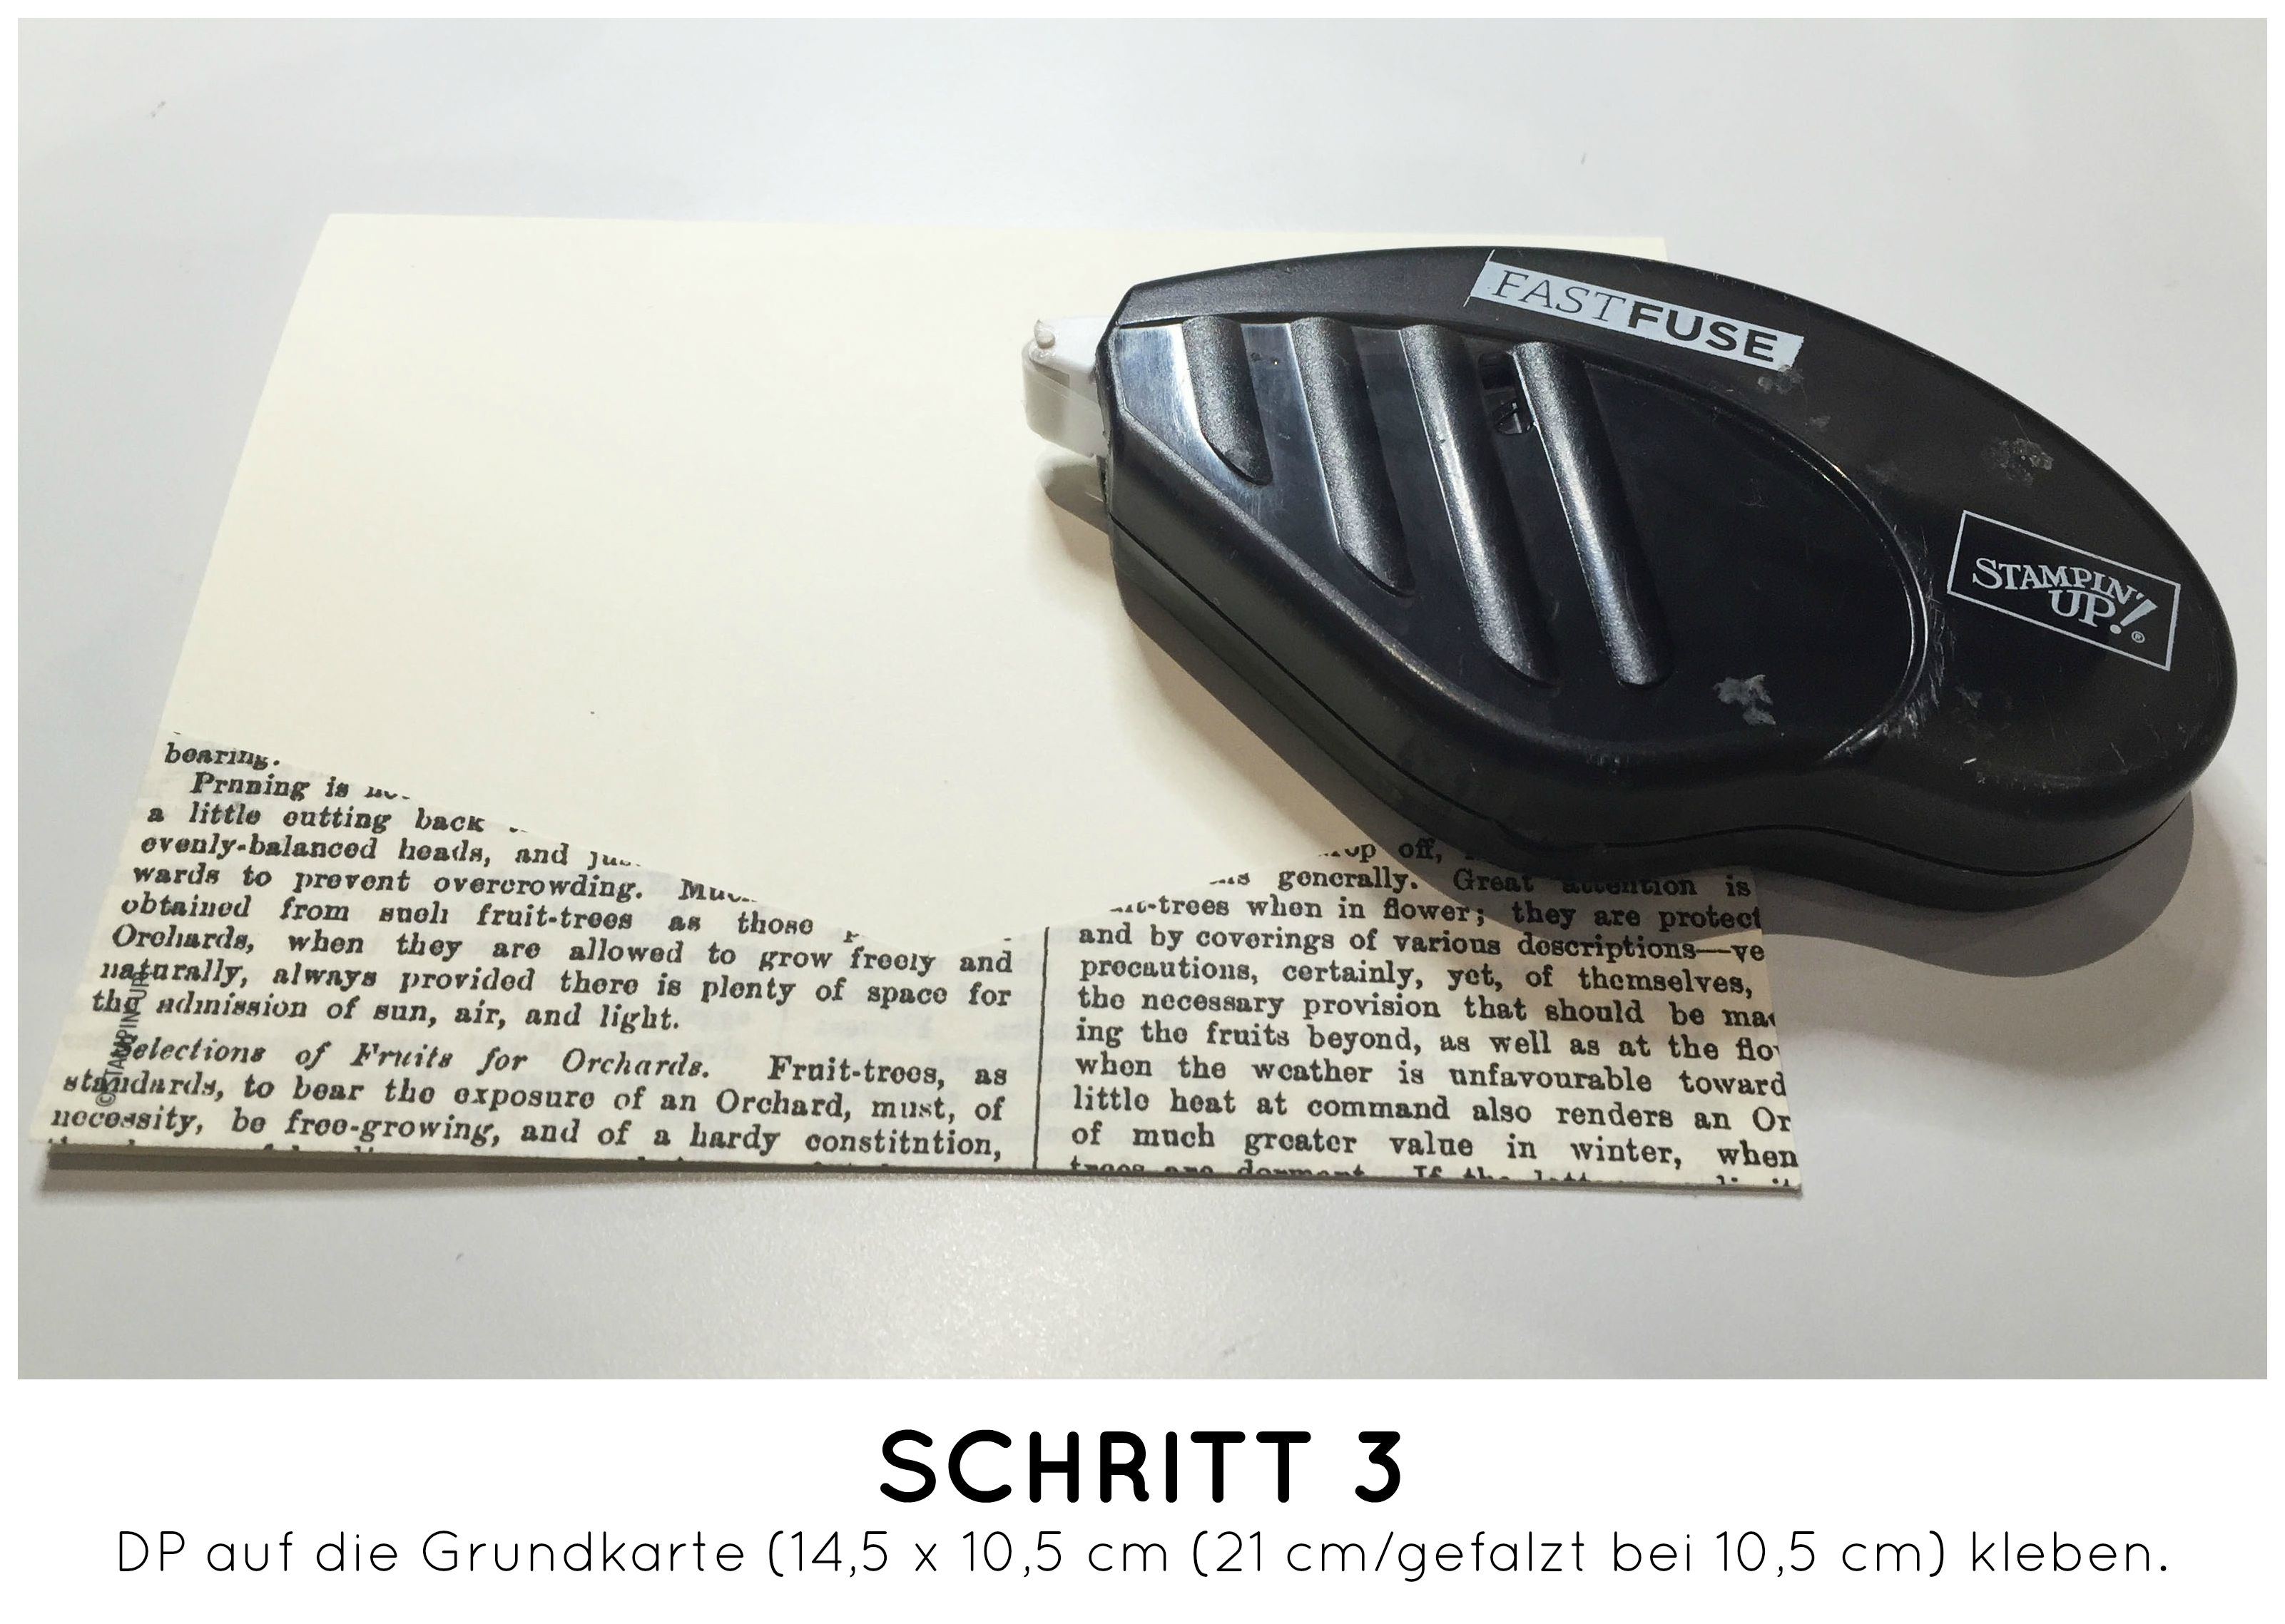 Stampin Up-Stempelherz-Dankeskarte-Zeig es am Montag Karte Danke Anleitung - Schritt 03